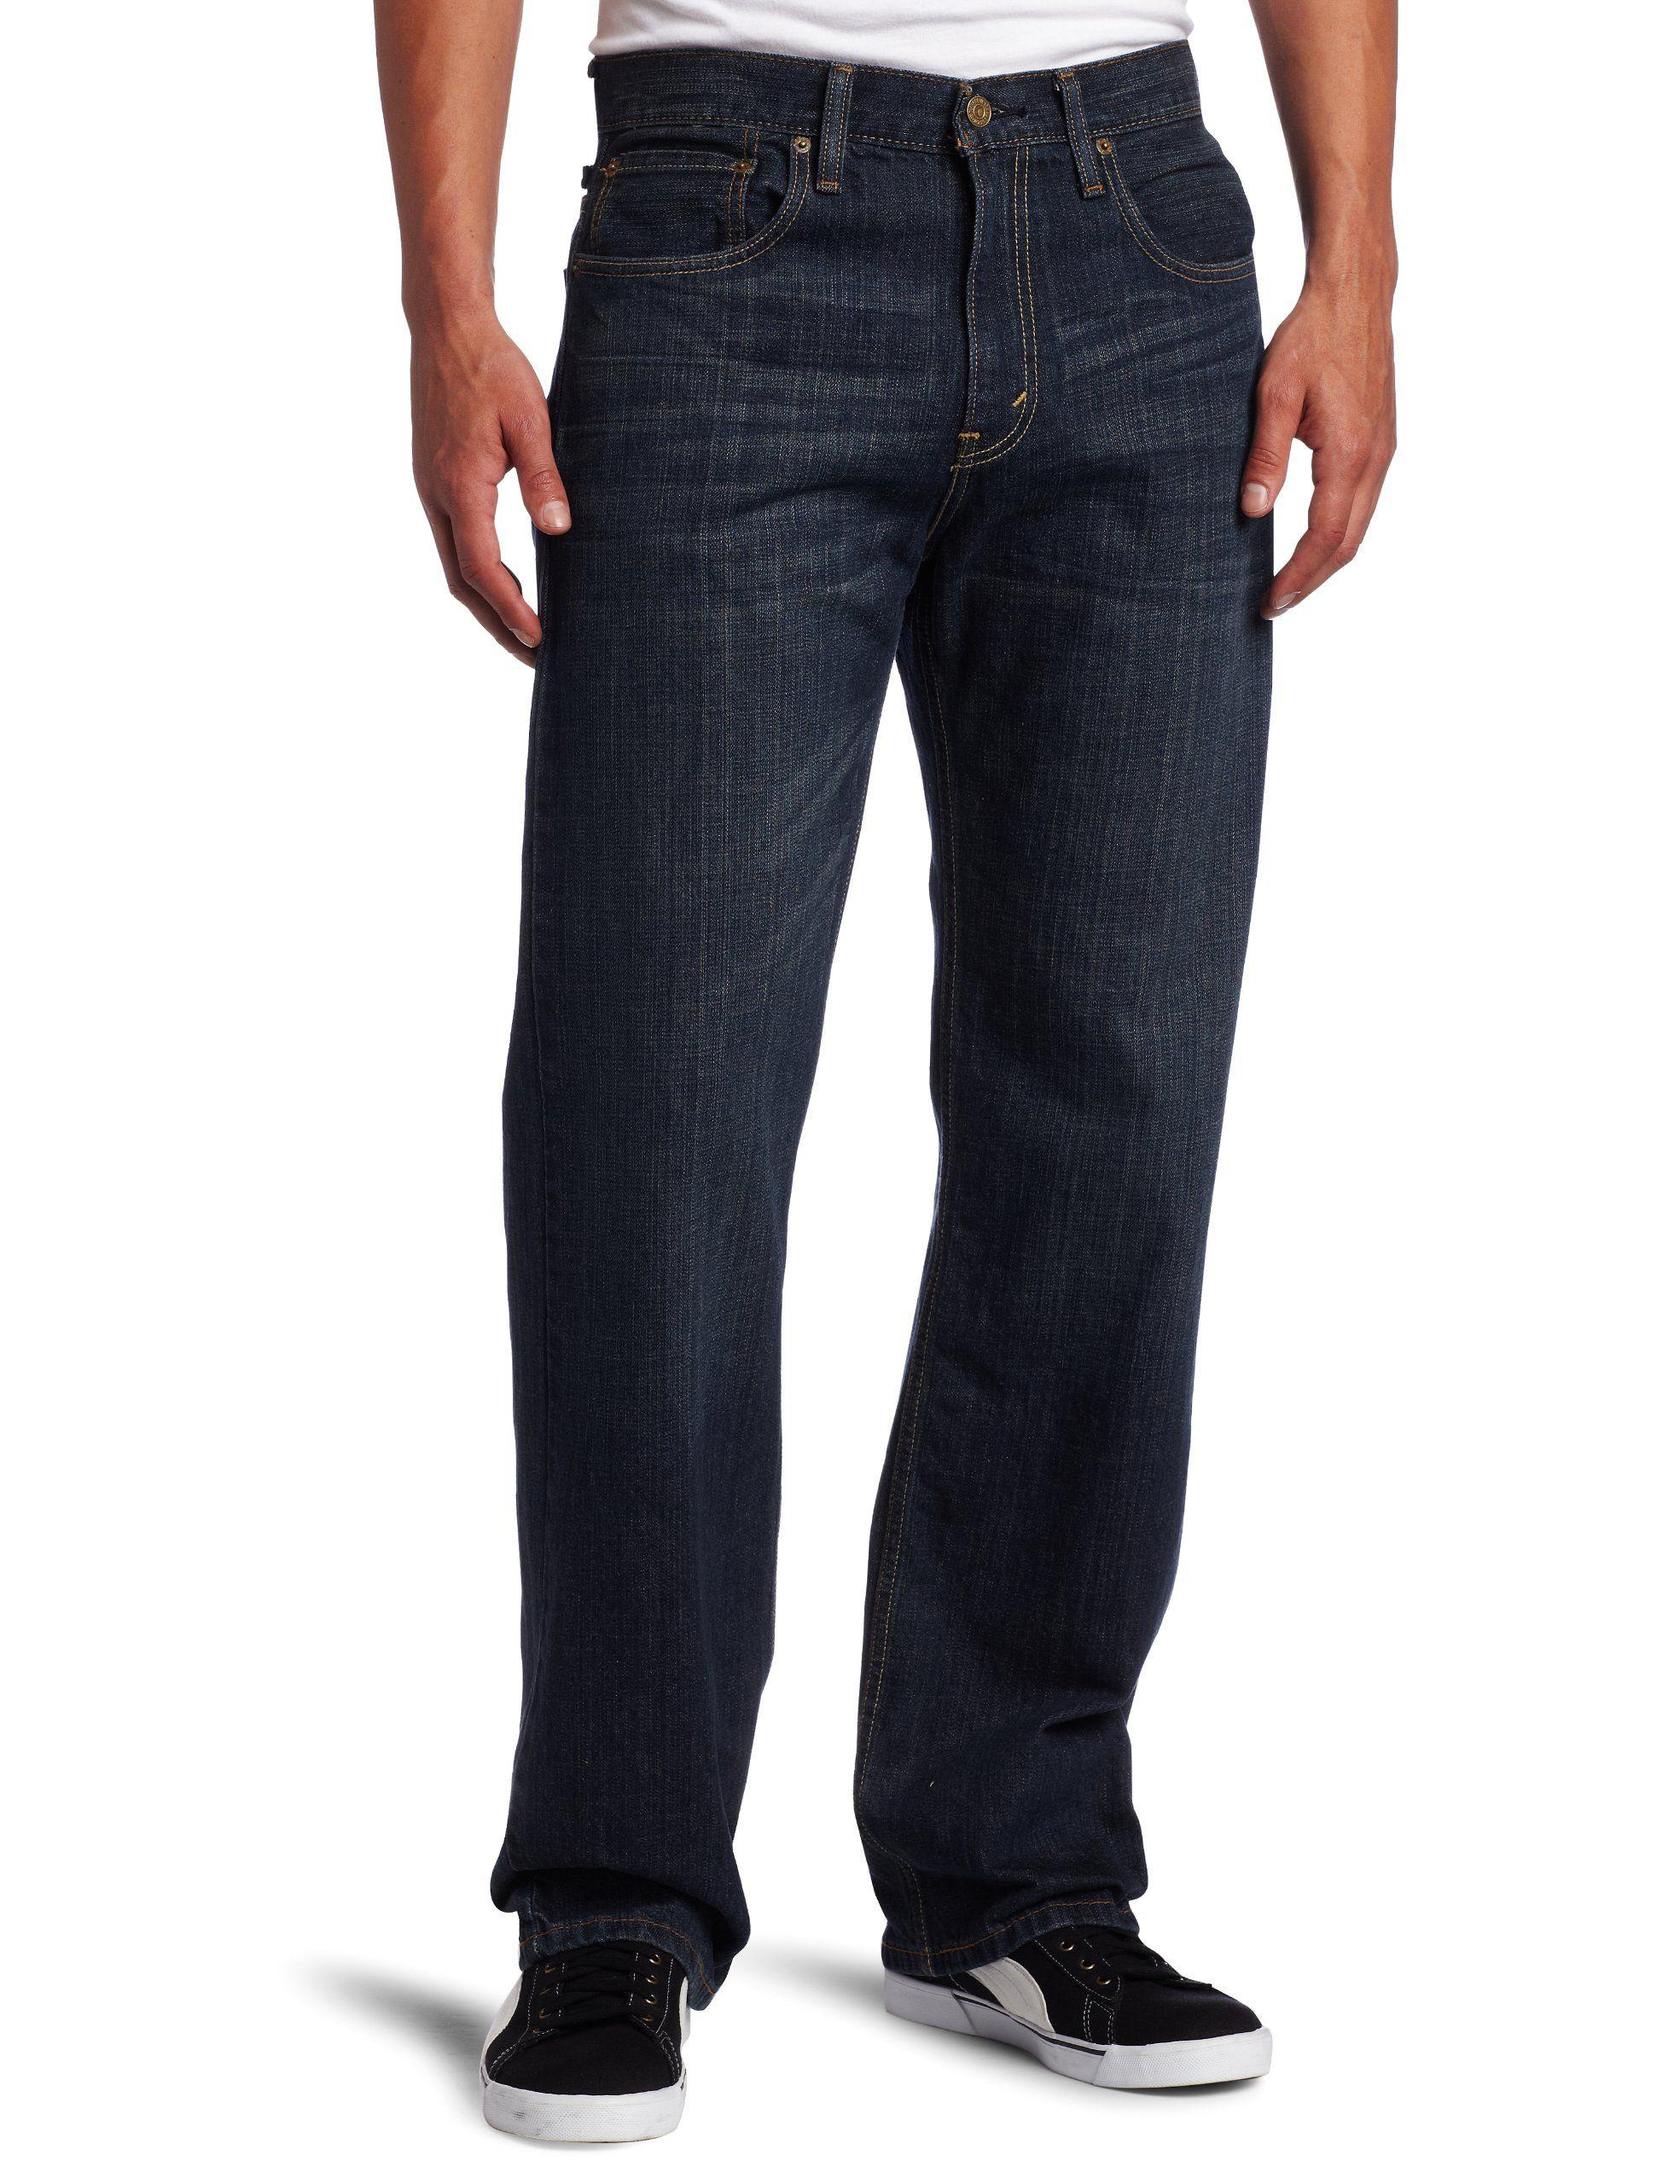 fc72ab8731d Amazon.com: Levi's Men's 569 Loose Straight Leg Jean: Clothing ...